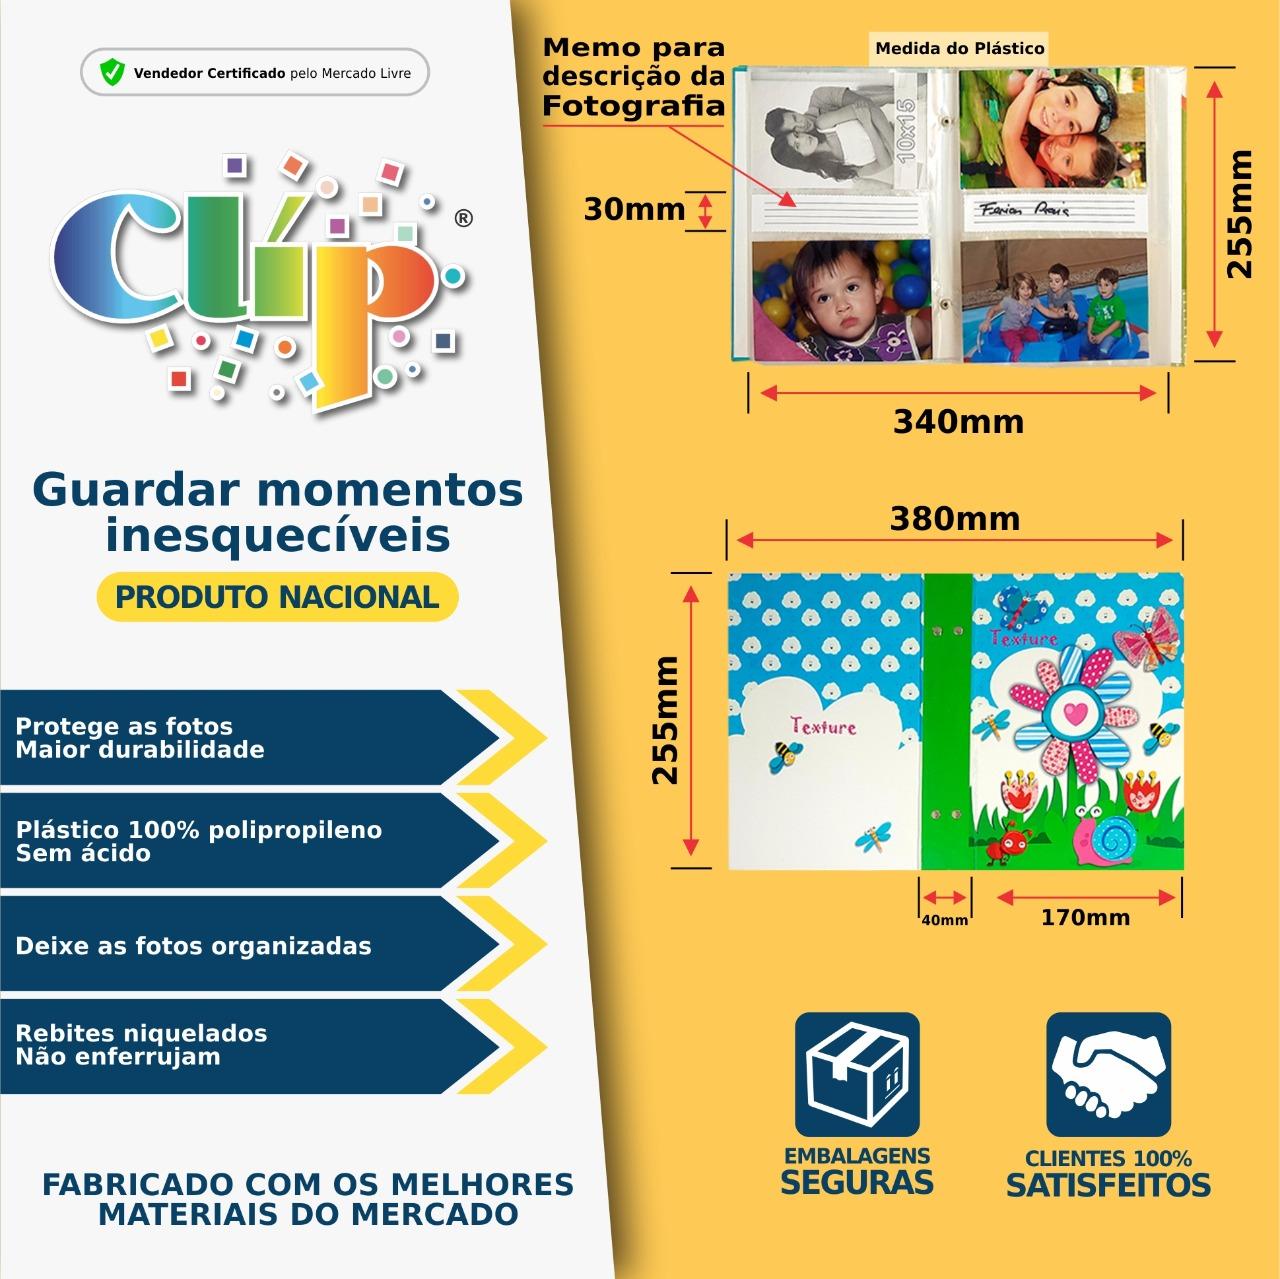 1 ALBUM DE COURO 10X15/208 FOTOS C/REBITE 8 CORES